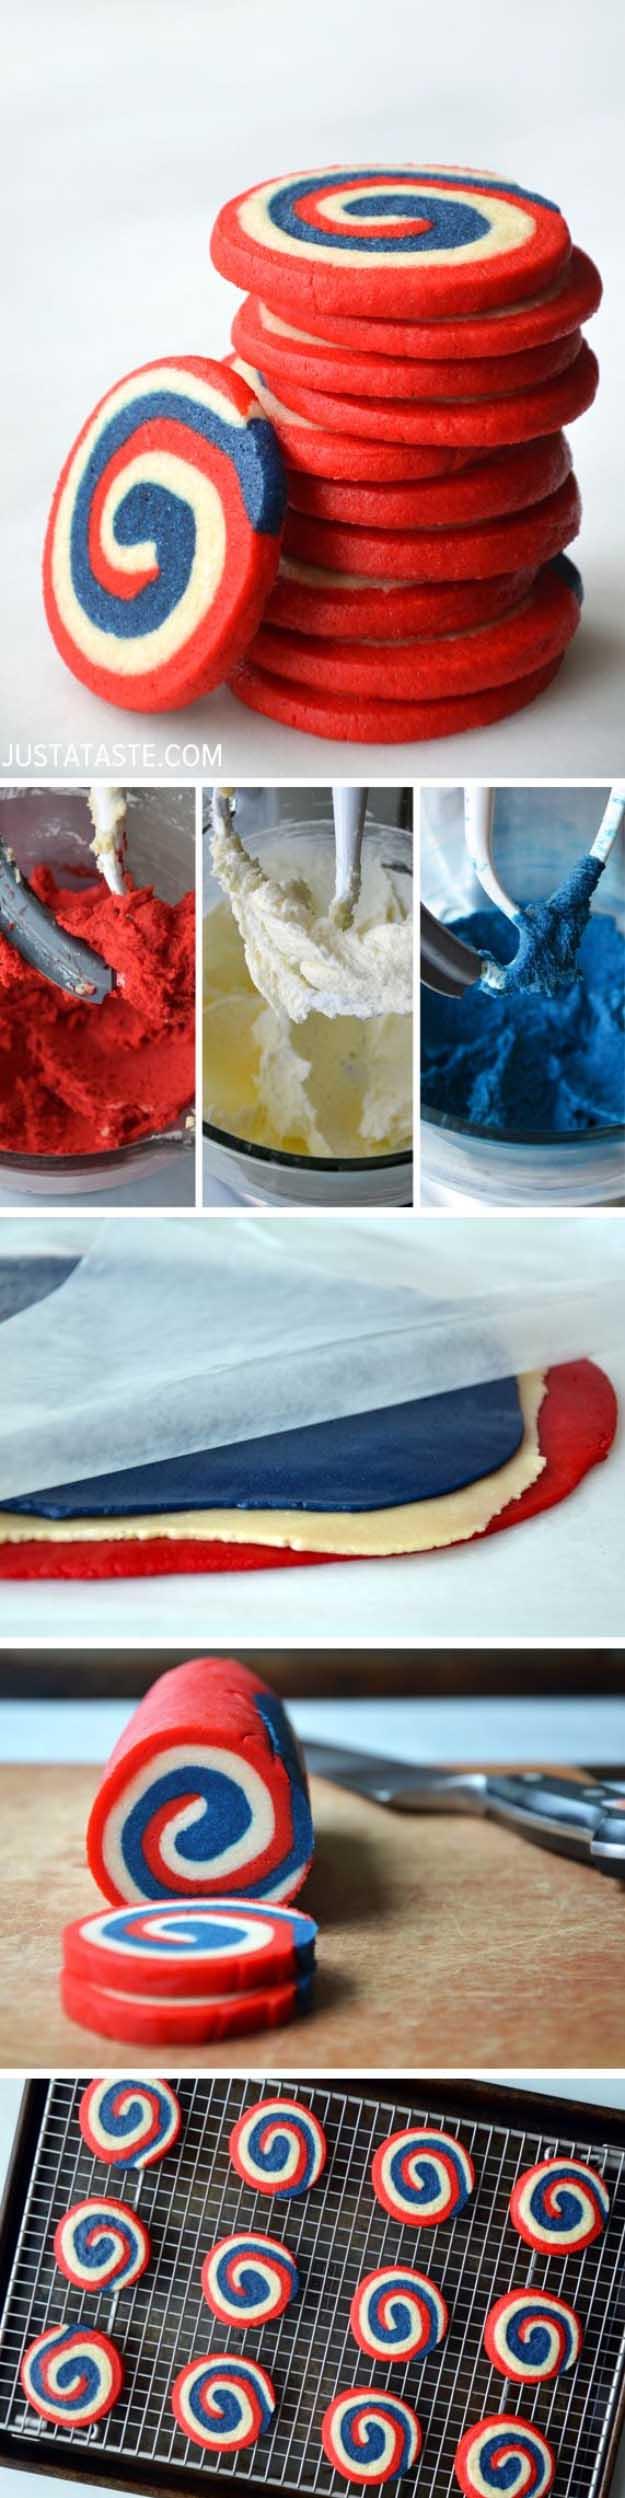 4th of July Dessert Ideas Patriotic Pinwheel Cookie Recipe| DIY Projects & Crafts by DIY JOY at http://diyjoy.com/4th-of-july-desserts-pinterest